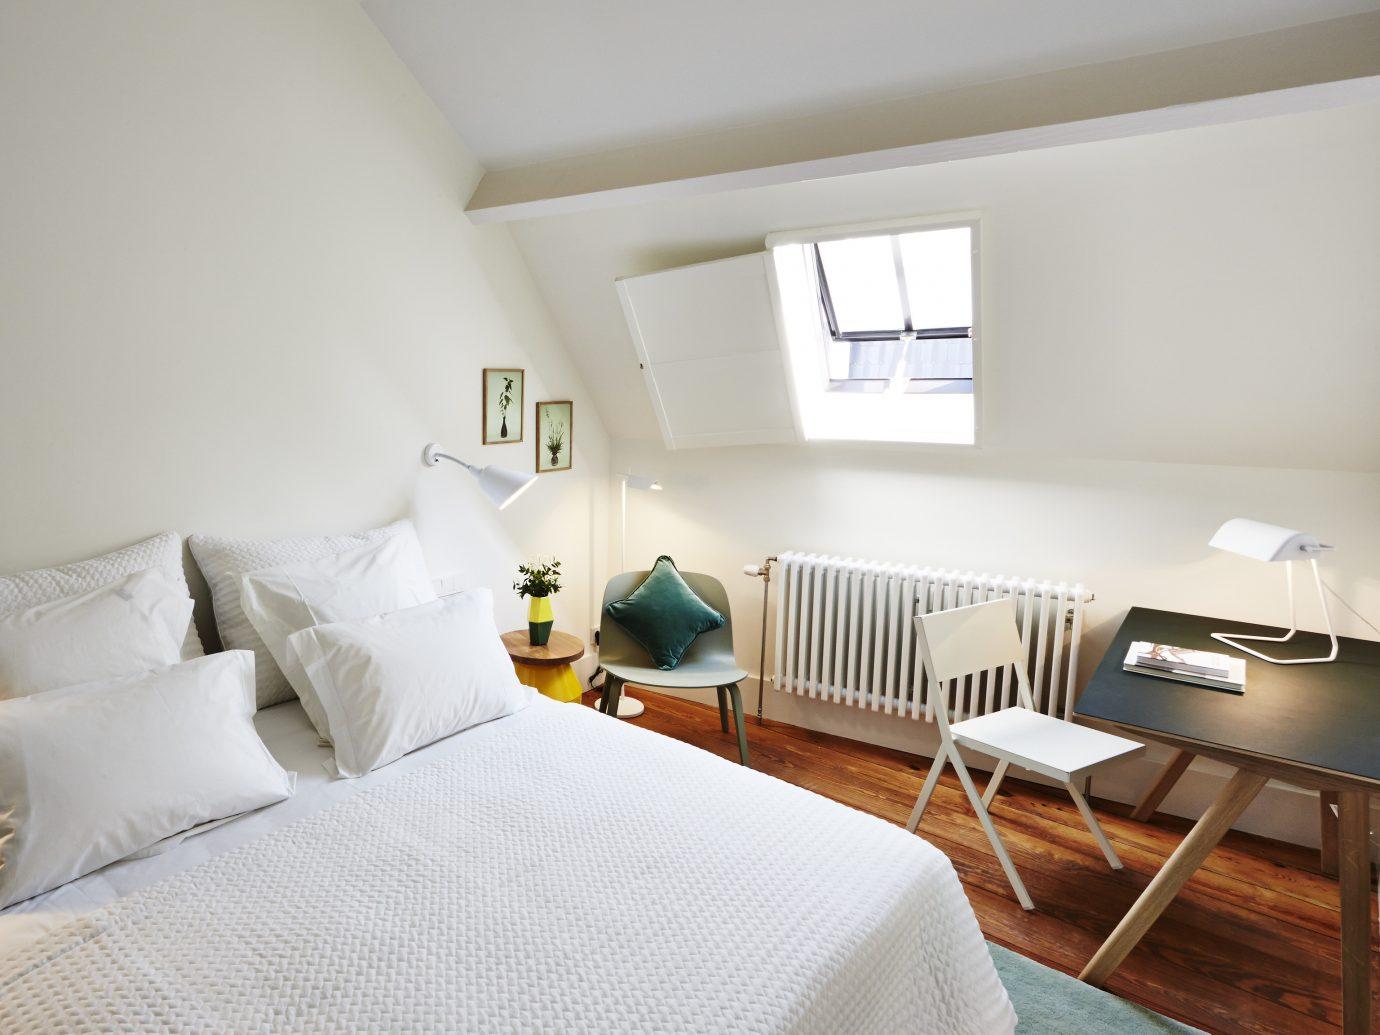 Bedroom at Hotel des Galeries